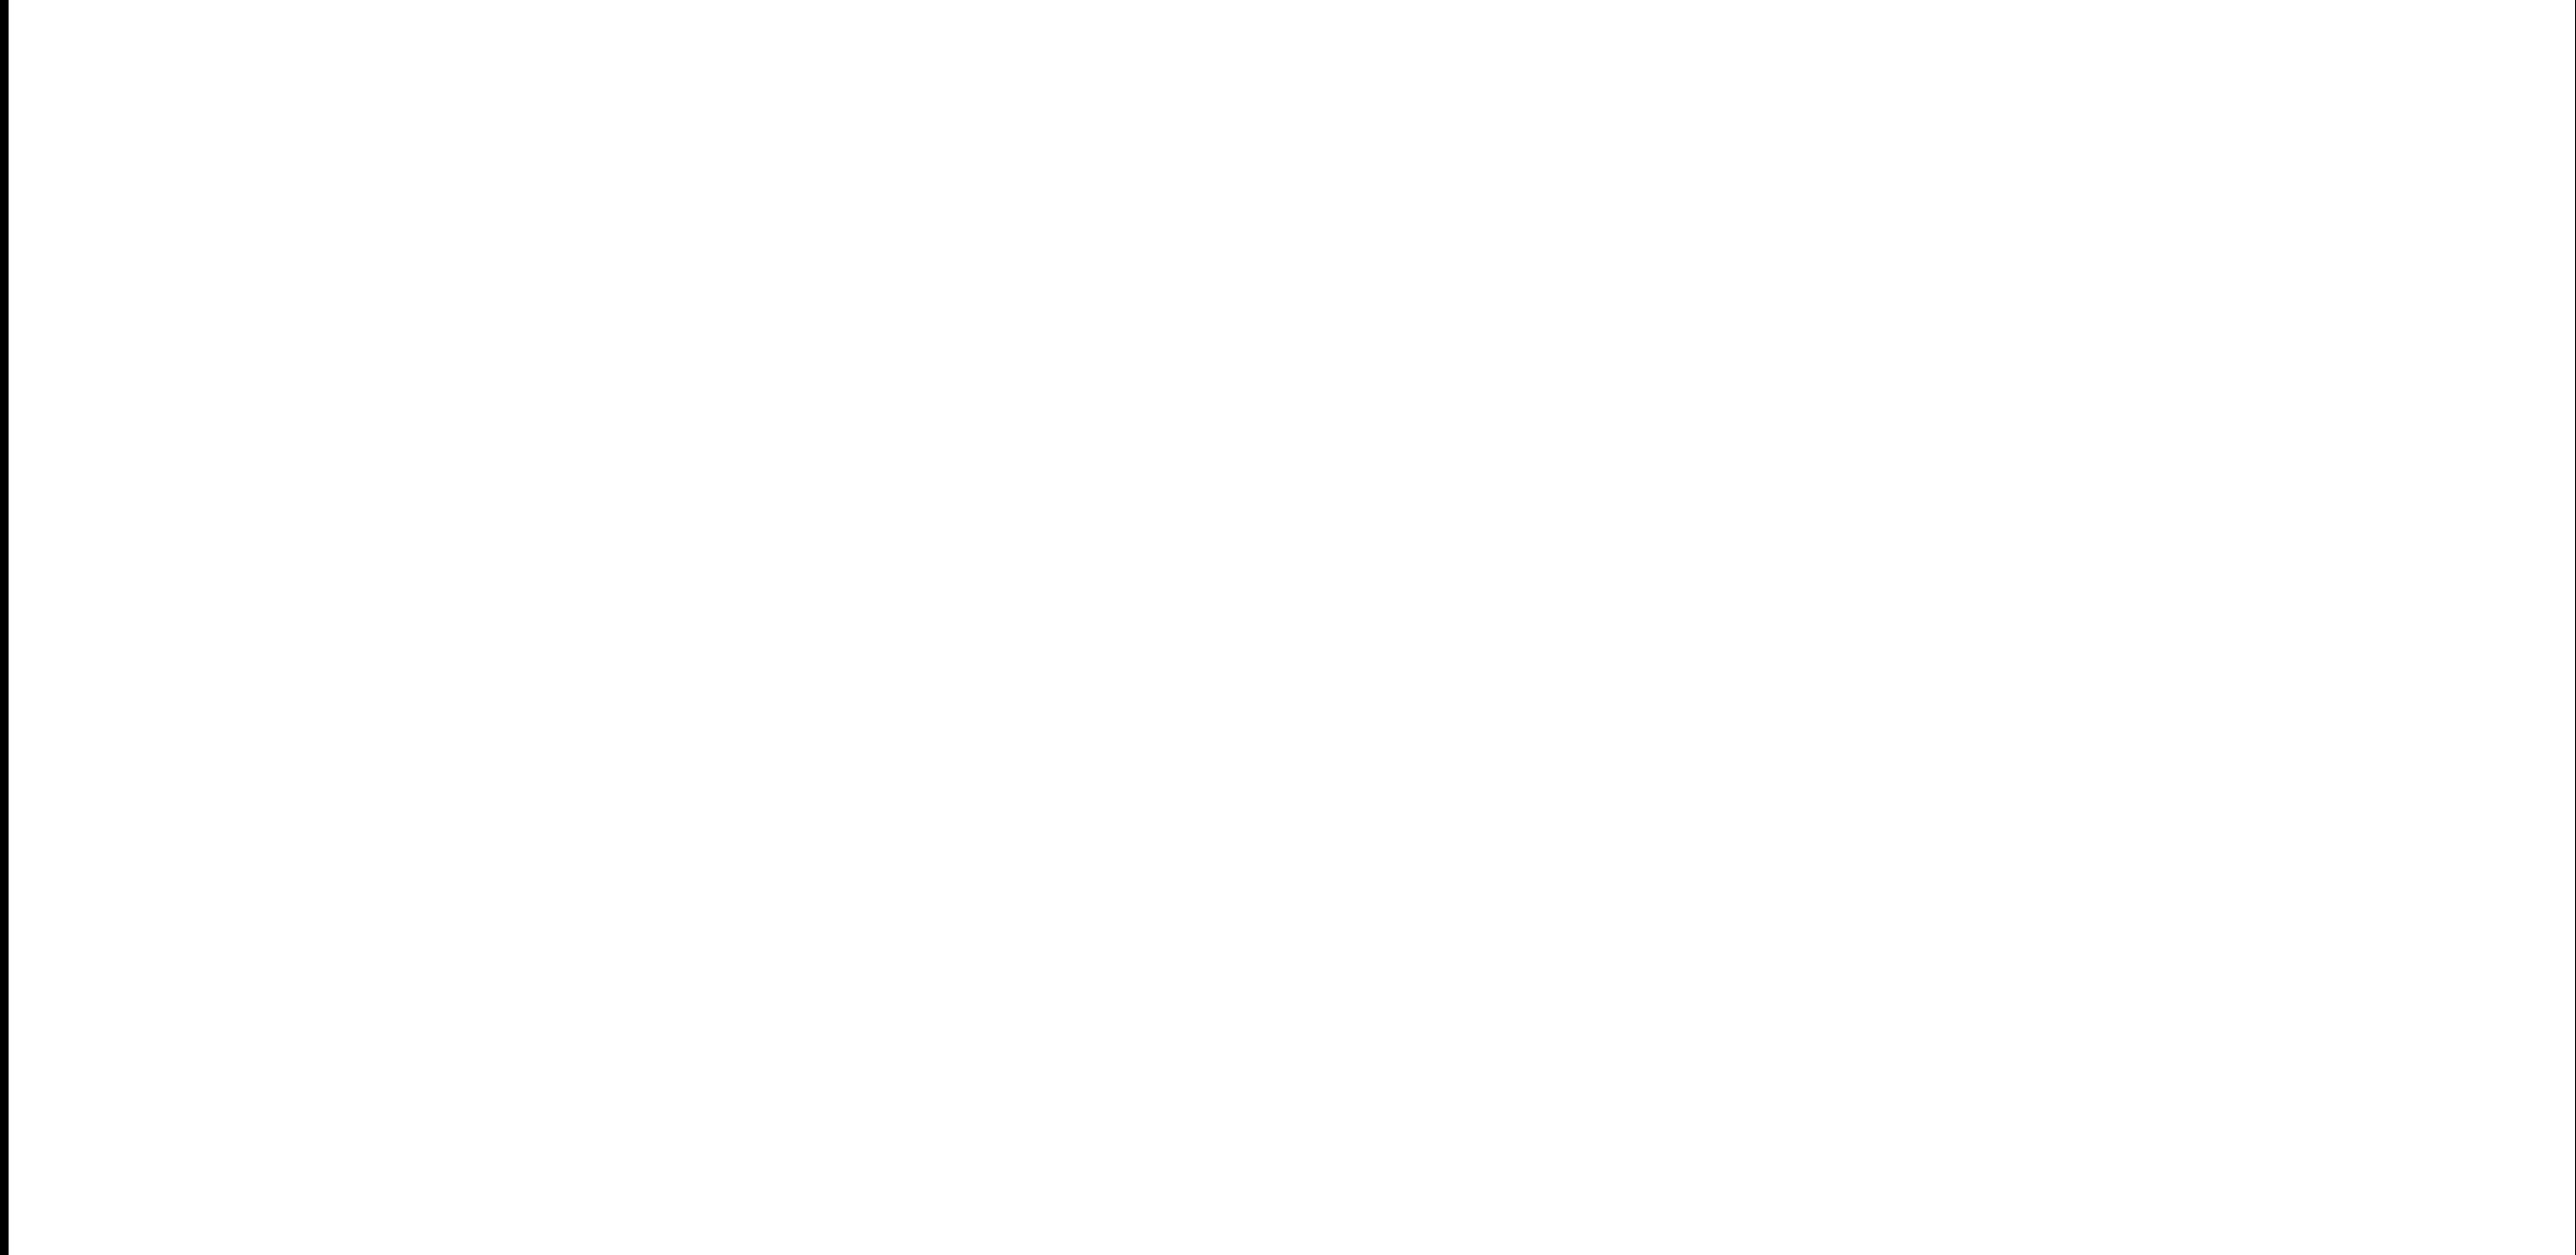 Homewood Suites by Hilton Los Angeles International Airport logo reversed